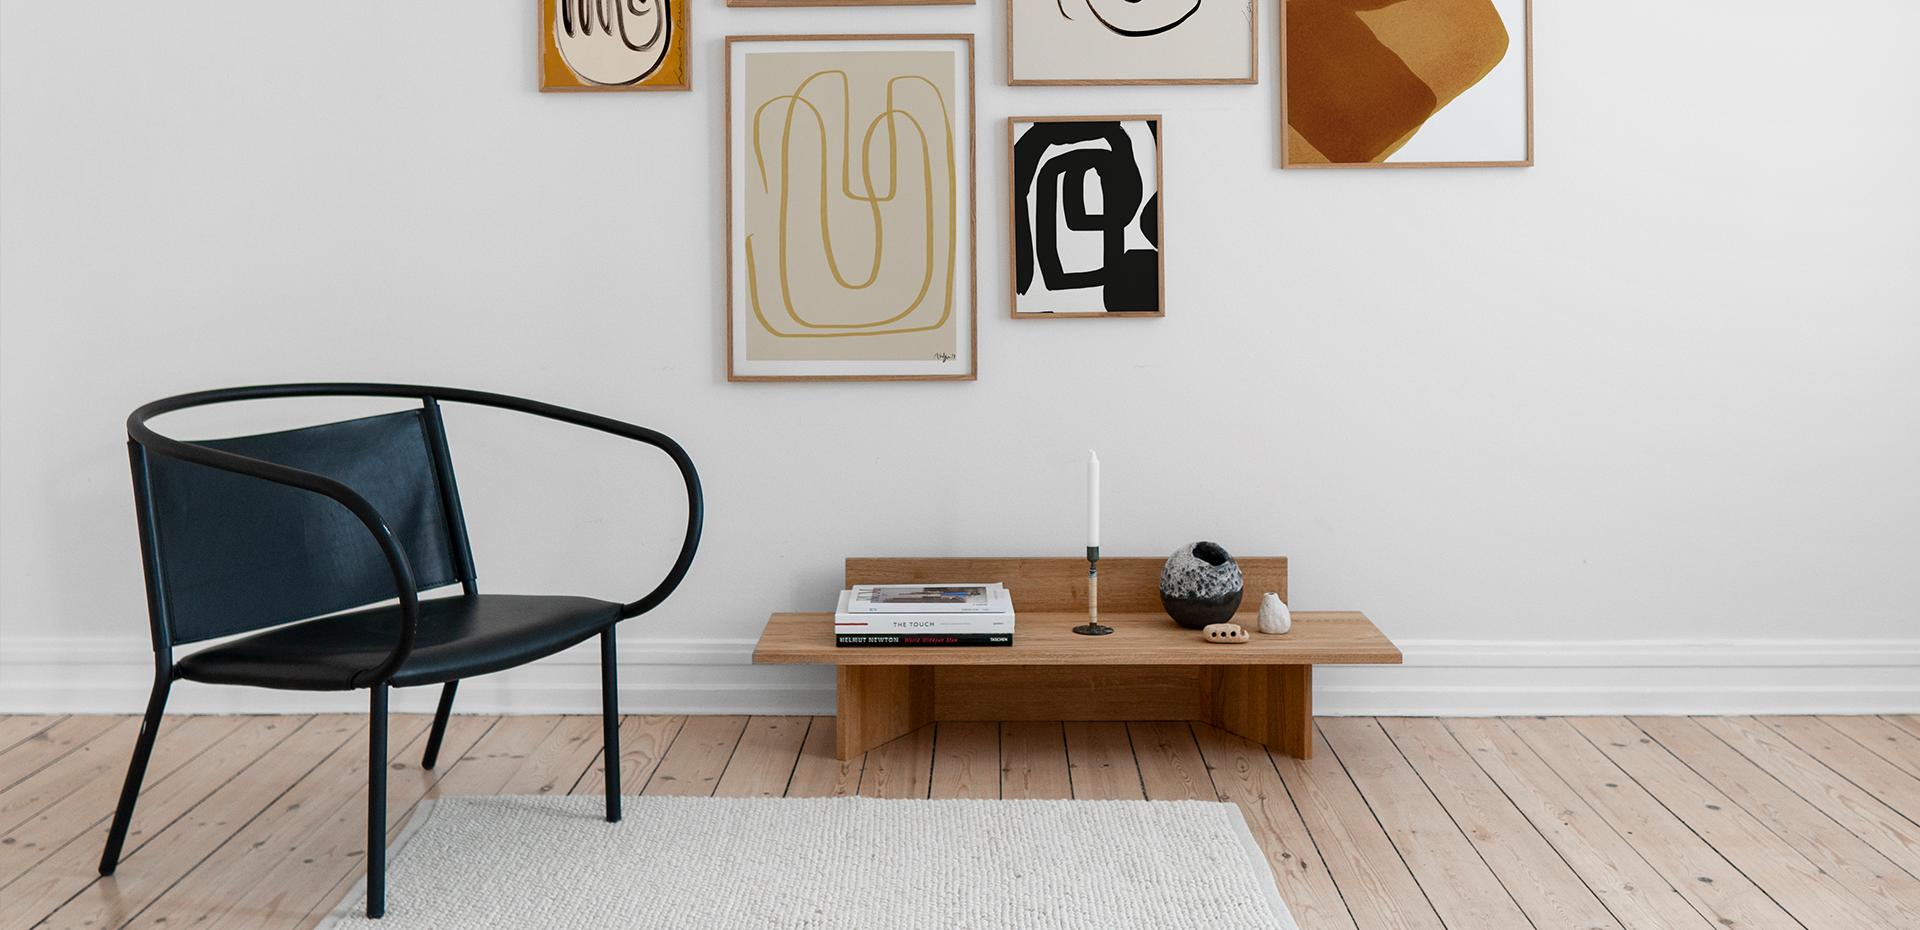 Interior Design Barcelona | The Room Living